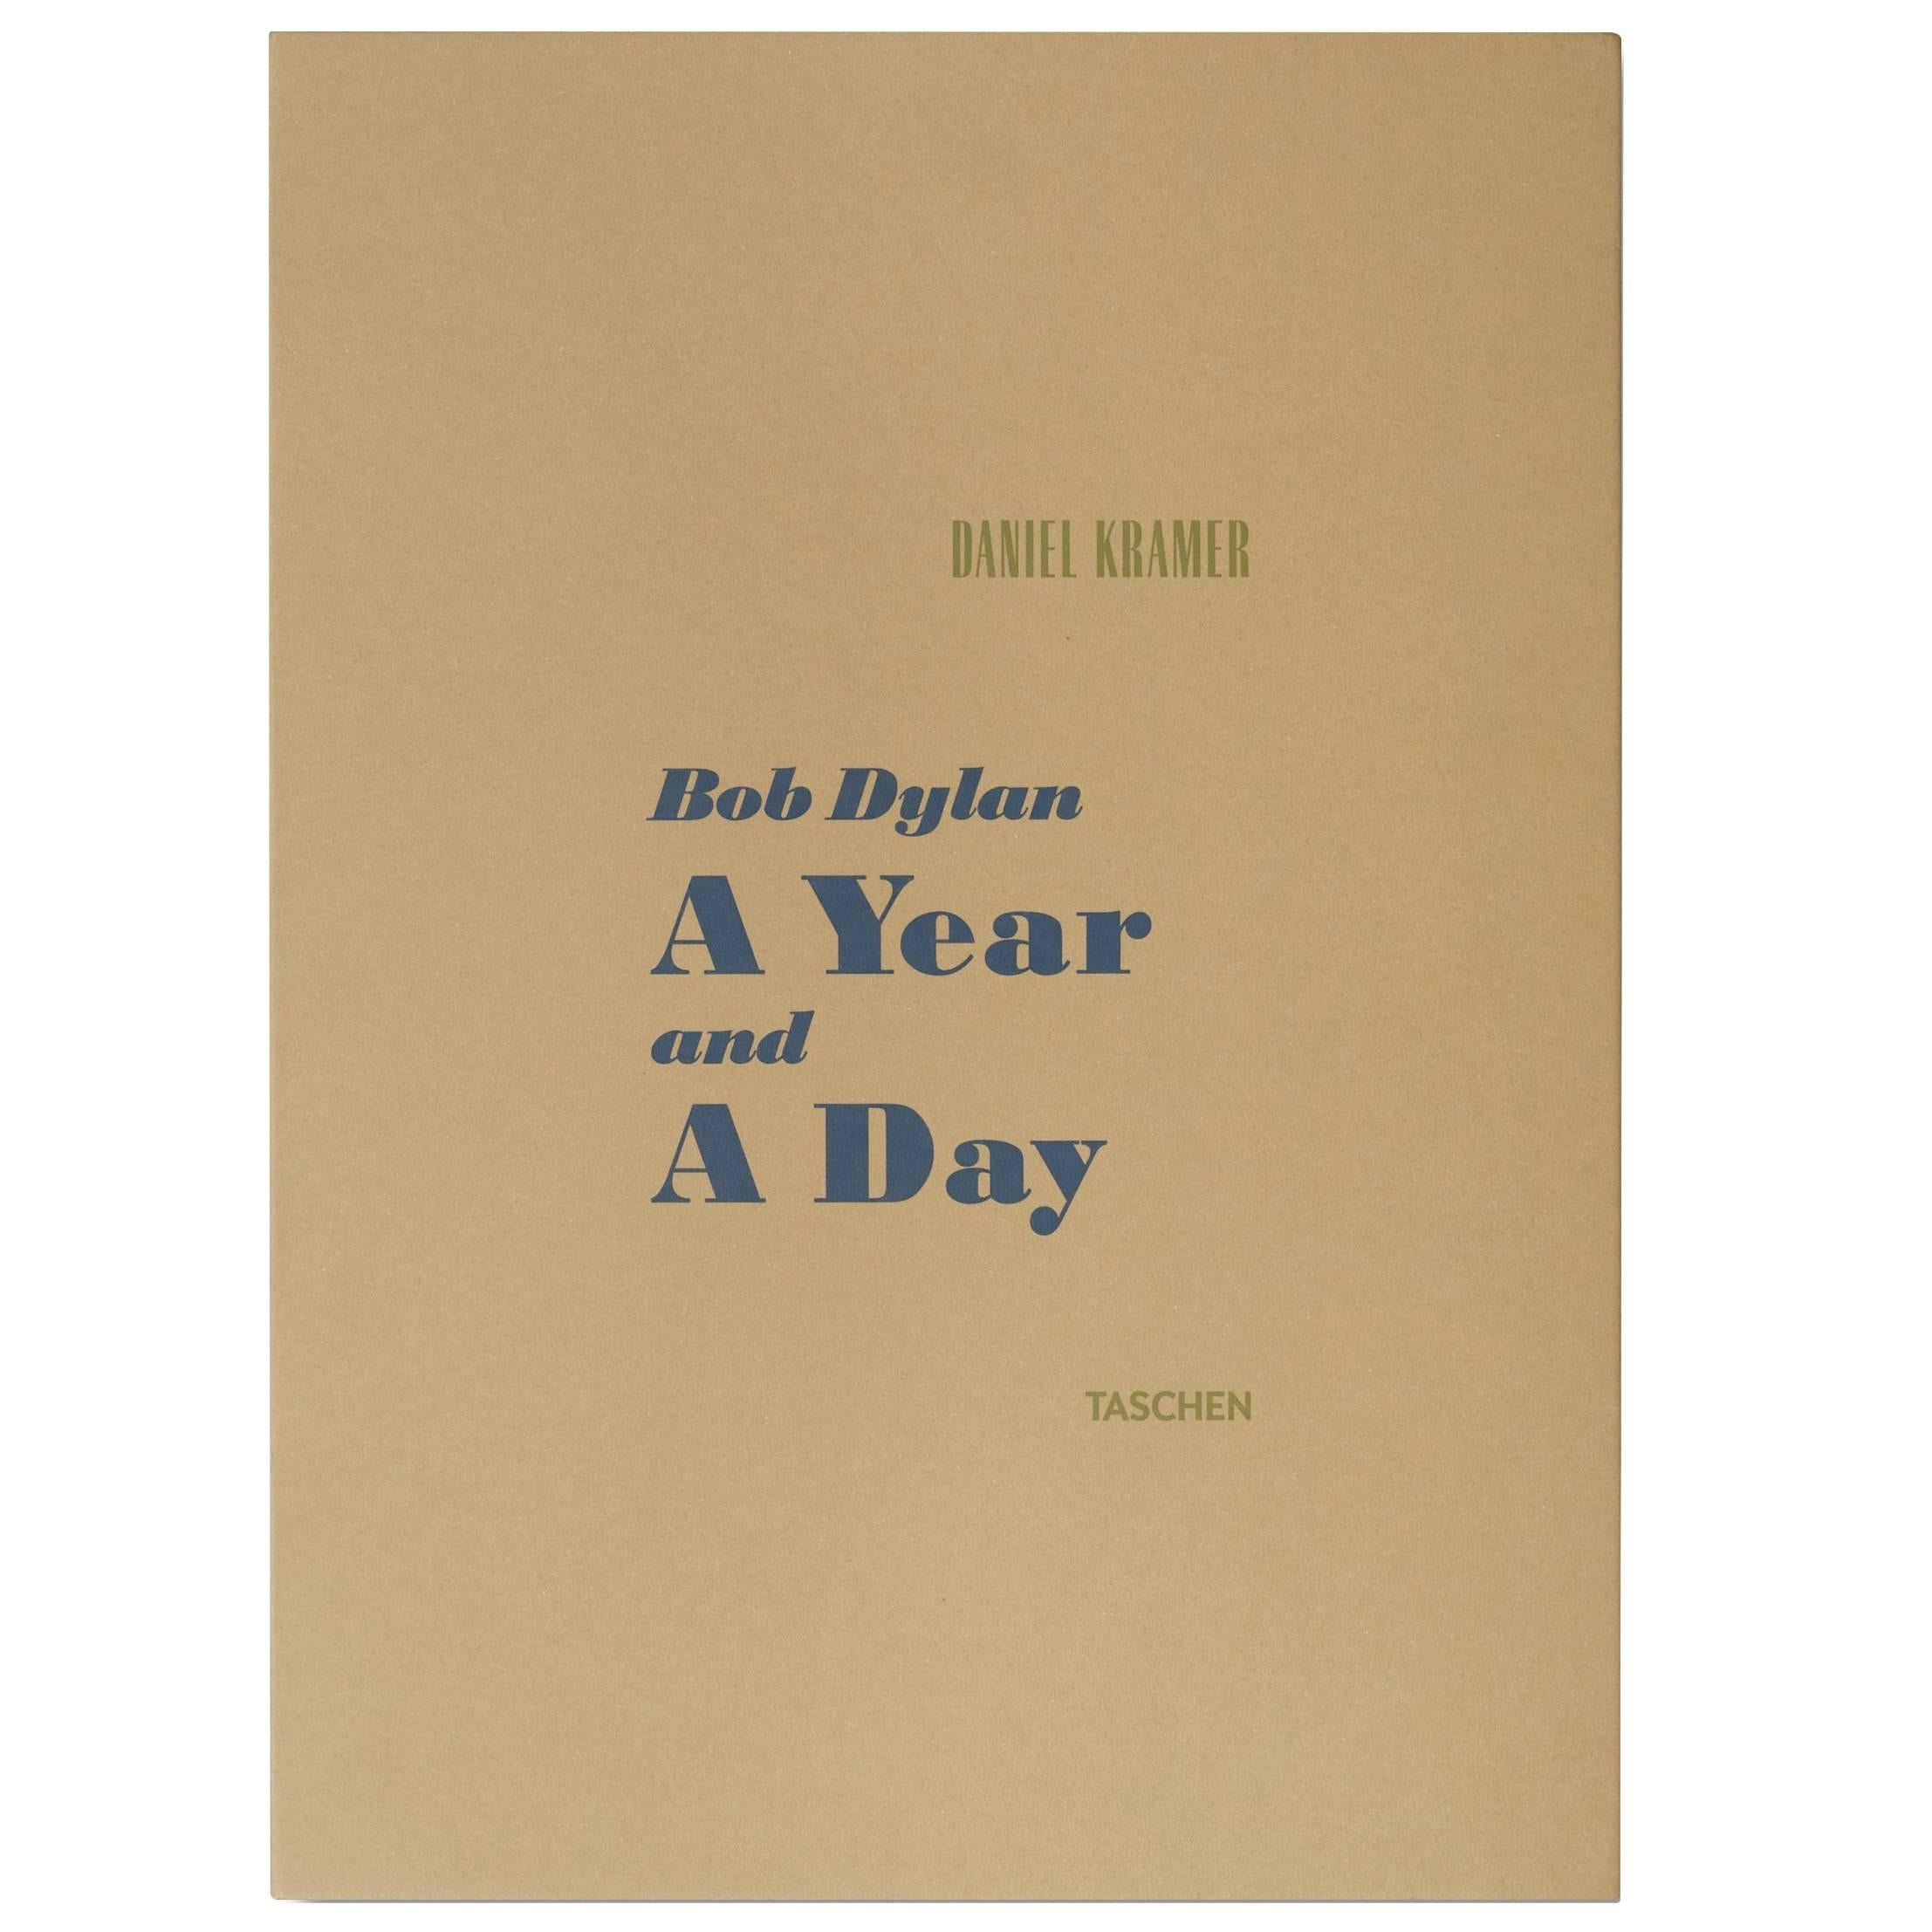 Bob Dylan: A Year and a Day by Daniel Kramer